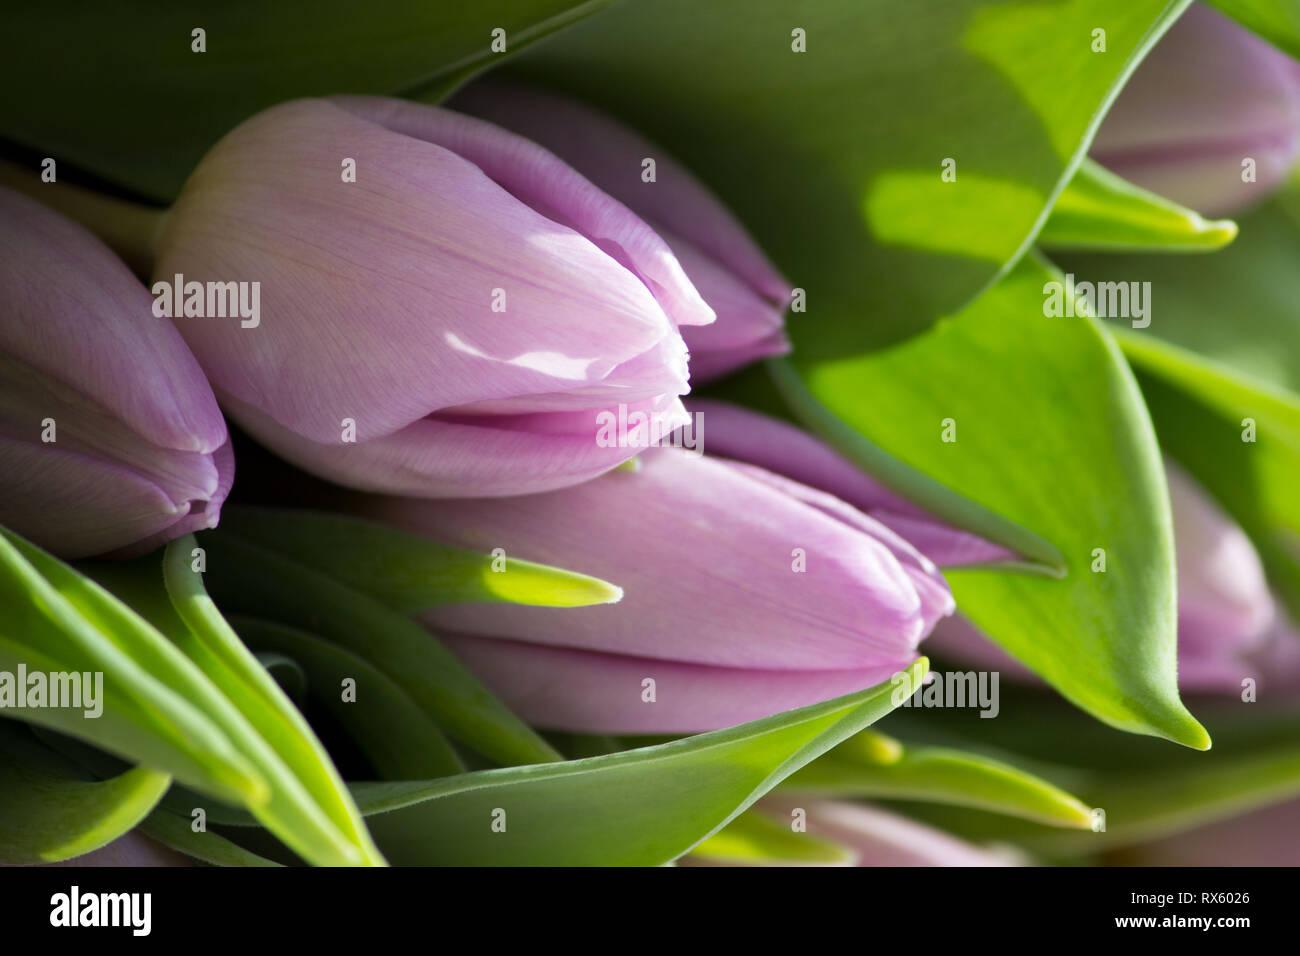 Beautiful bouquet of many small lavender tulips Tulipa for celebration. Stock Photo